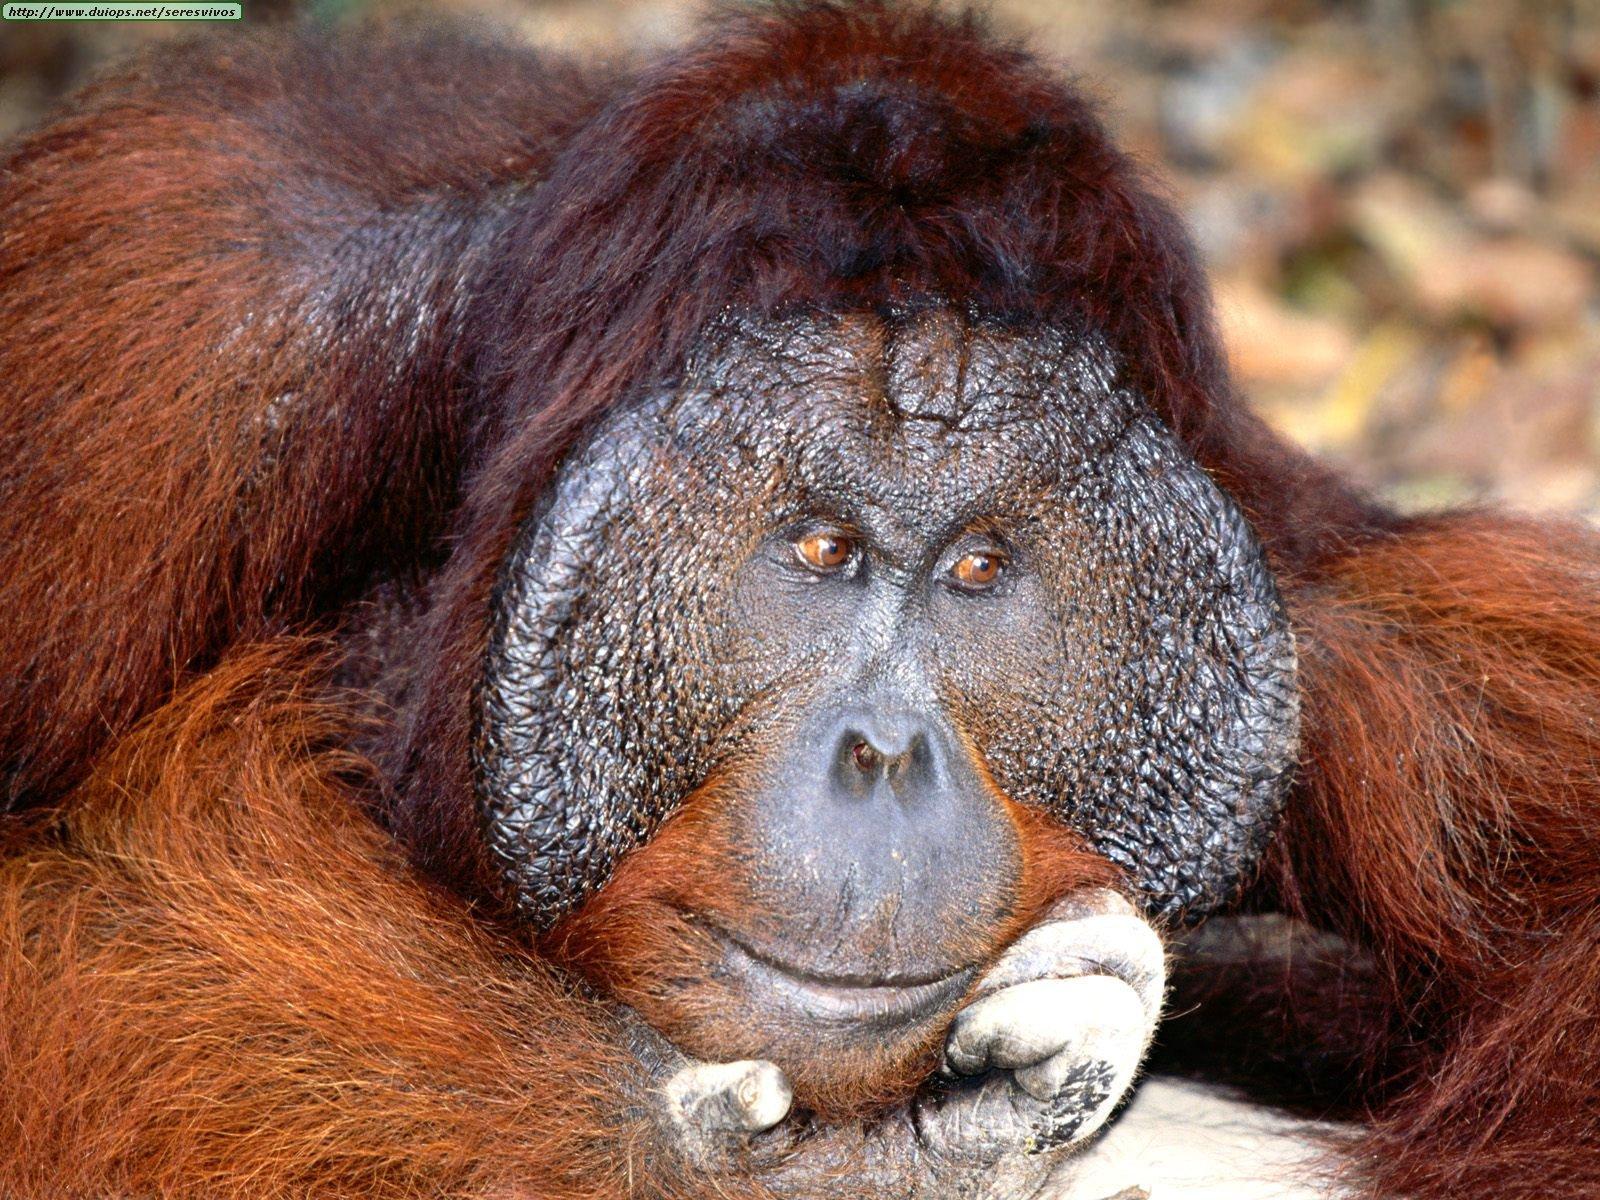 http://www.duiops.net/seresvivos/galeria/orangutanes/Animals%20Orangutans_Daydreaming,%20Bornean%20Orangutan.jpg